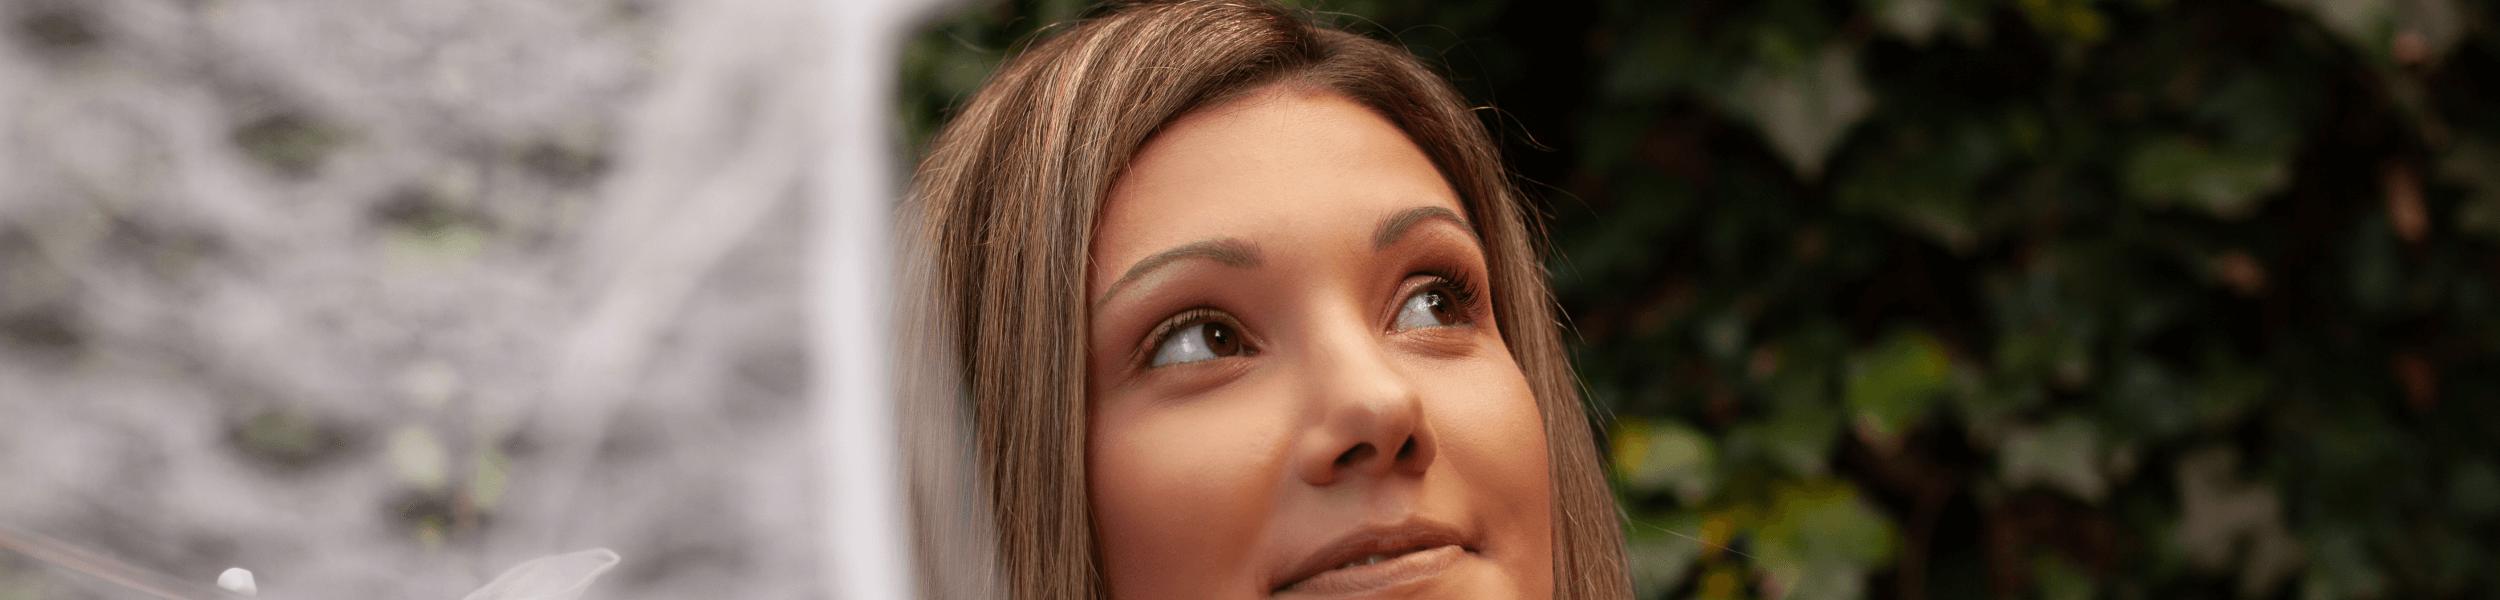 curso mulheres reais Inês Magalhães Cura Integrada